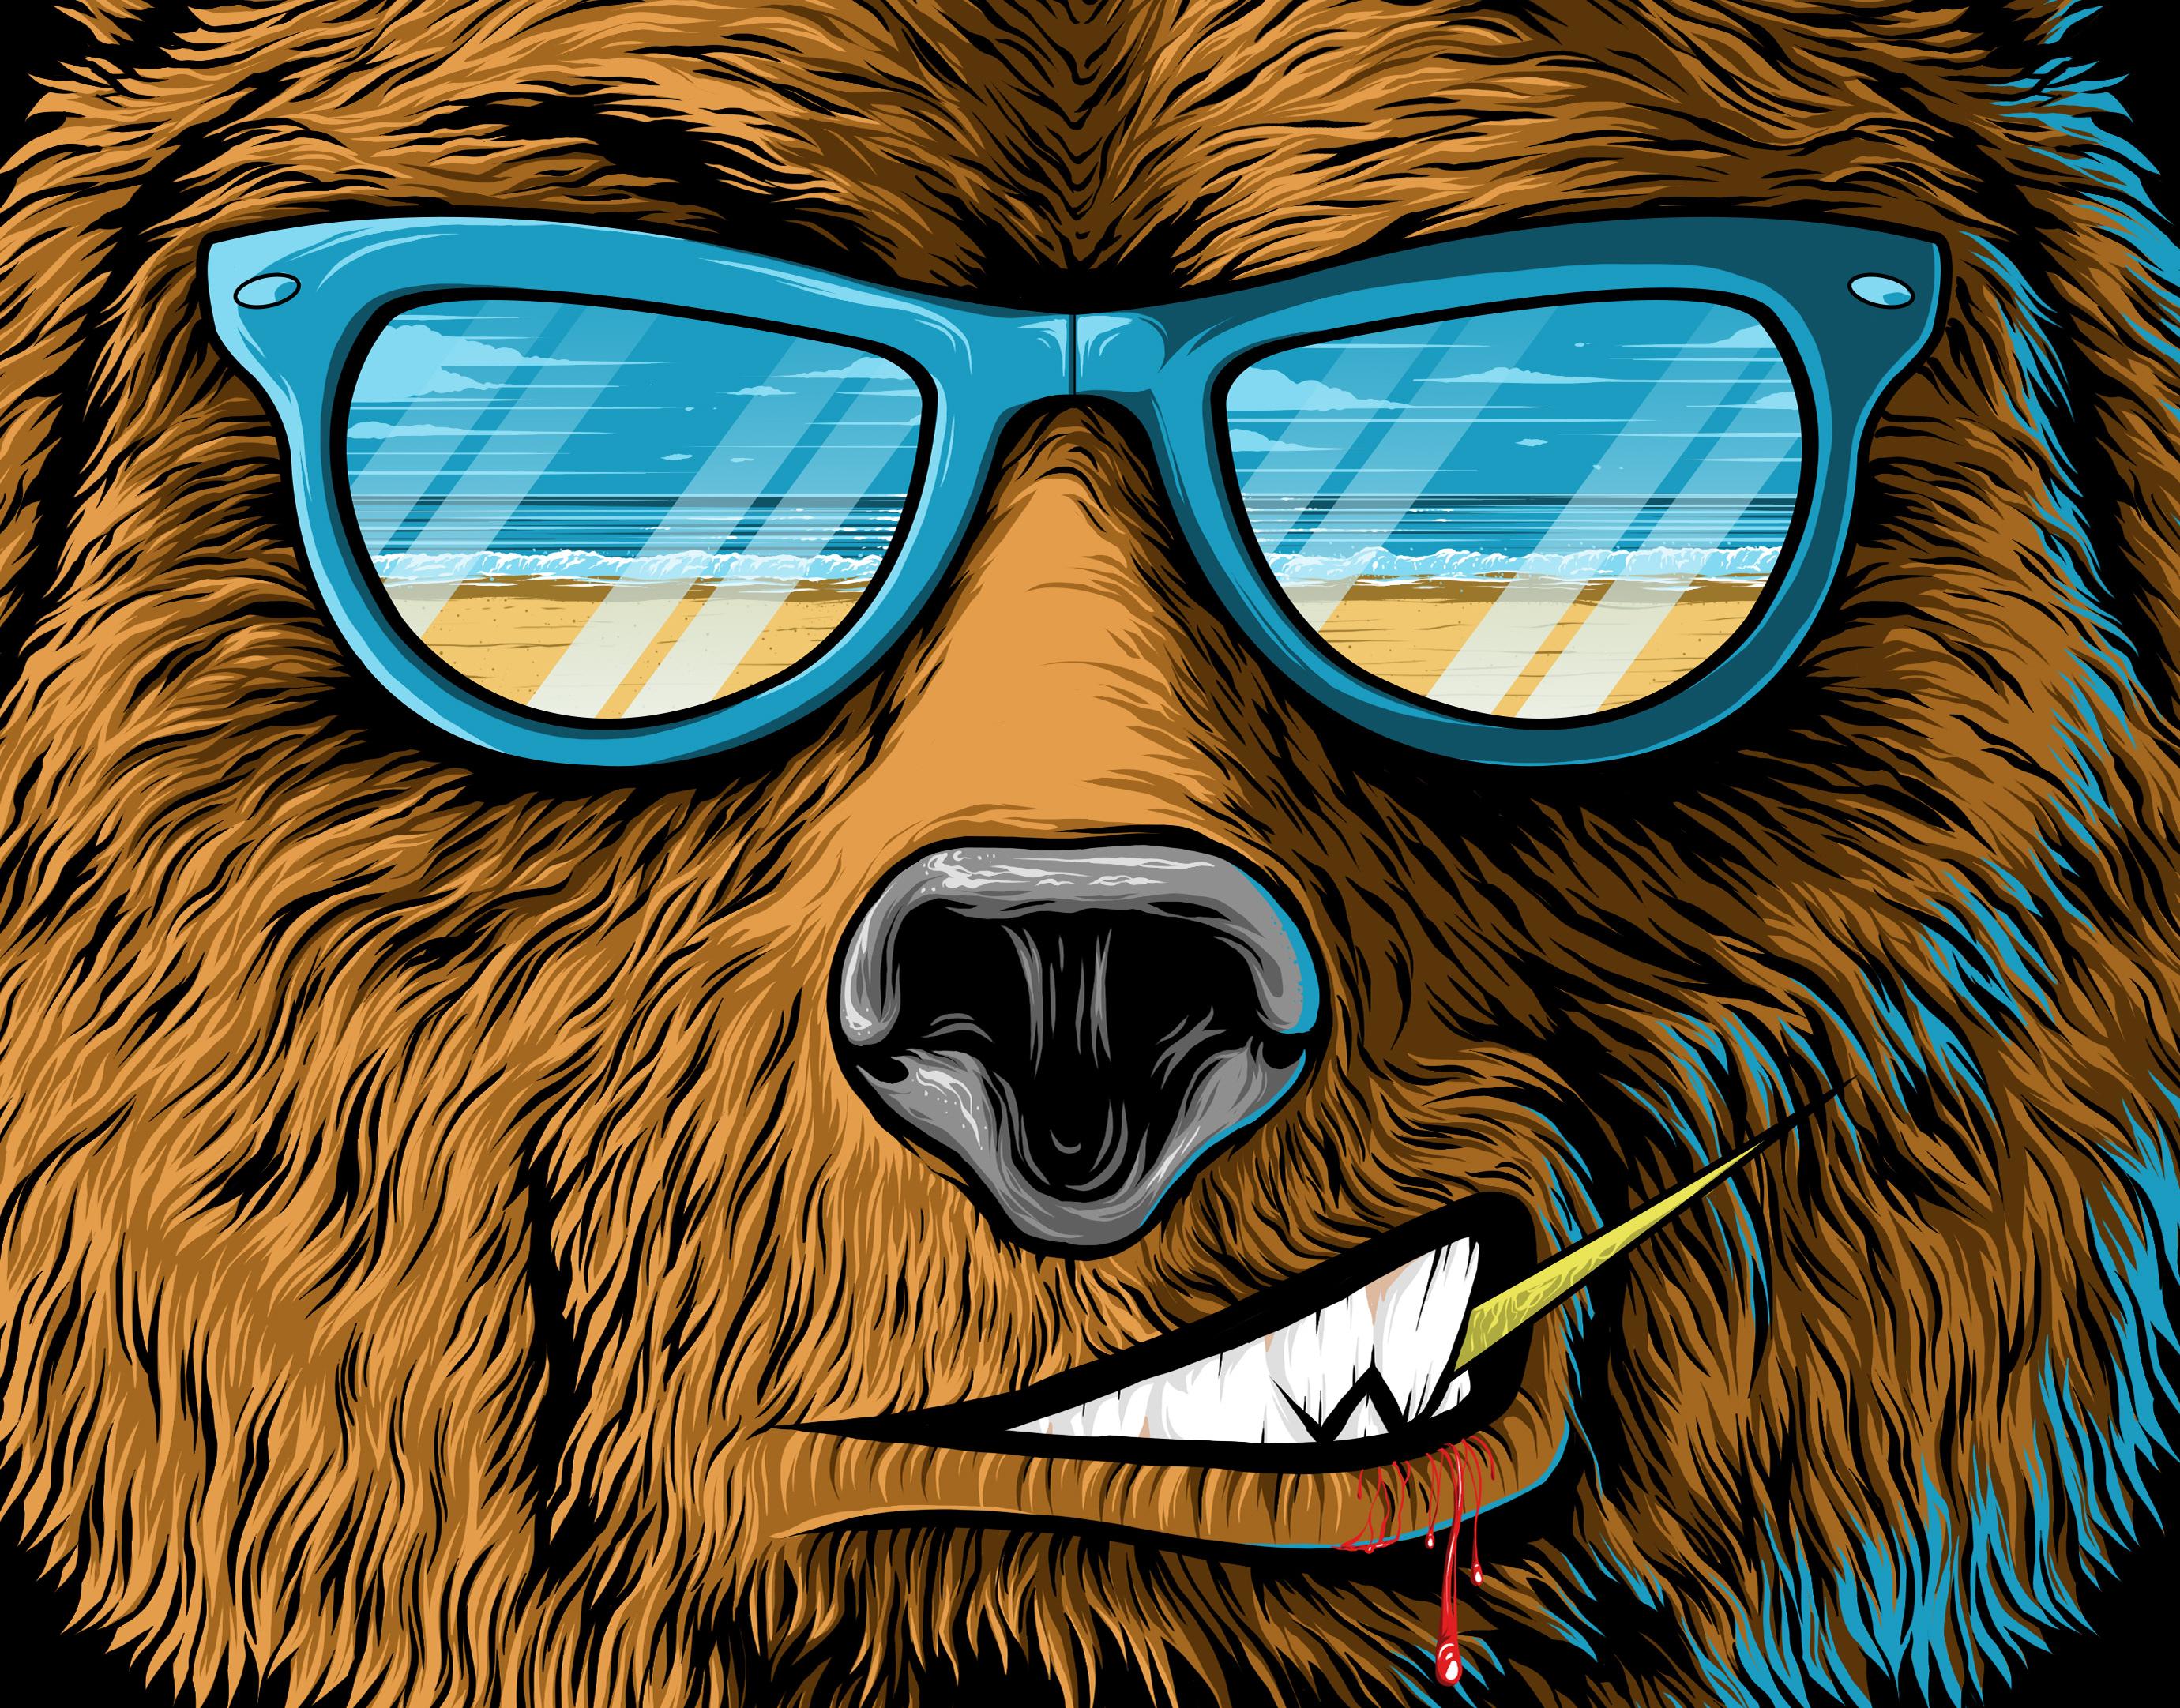 времена картинки на аву с медведями алгоритмы